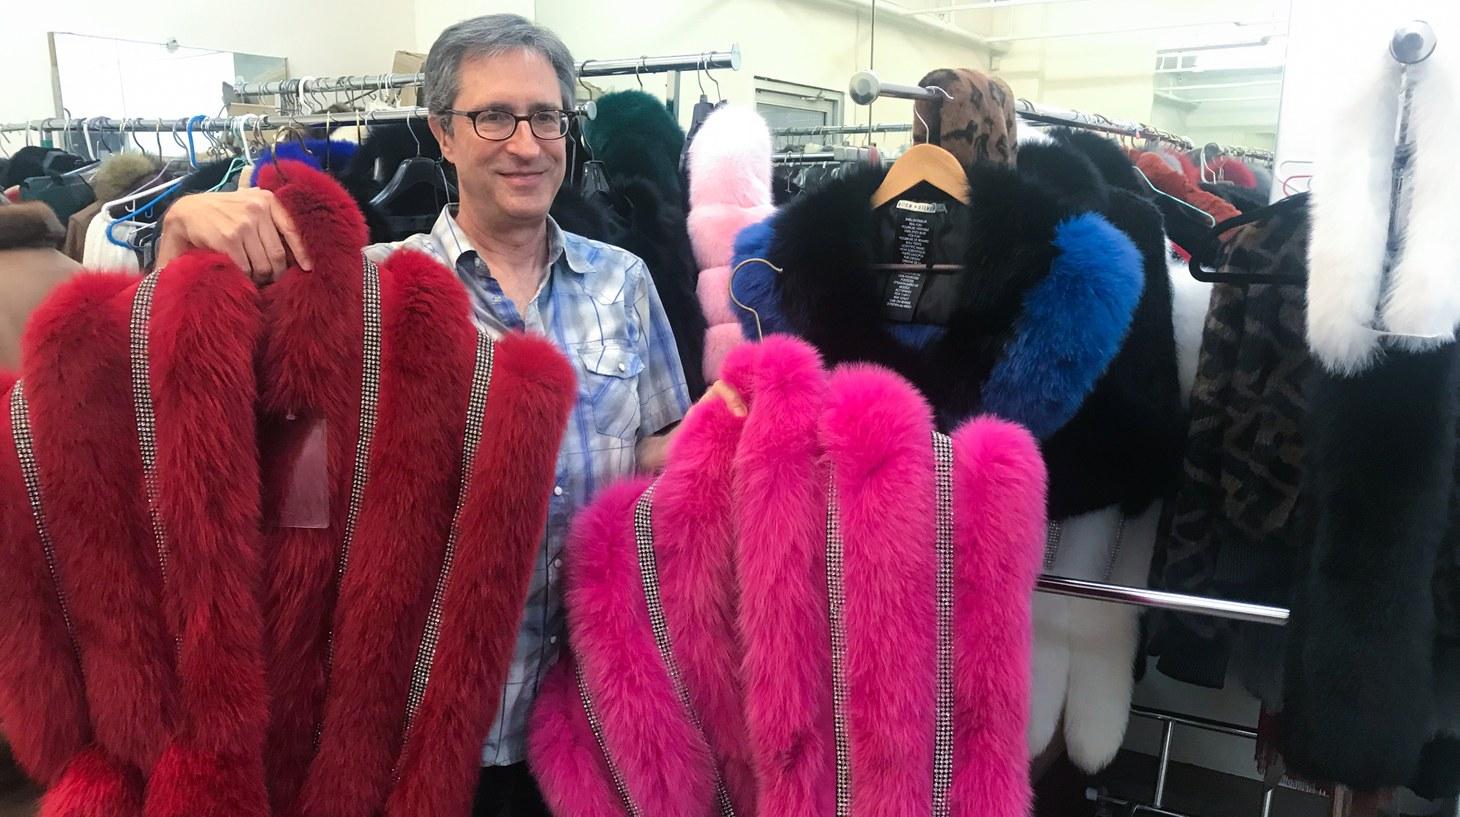 Daniel Wachtenheim shows off some new fur coats at Wachtenheim Furs in downtown Los Angeles.